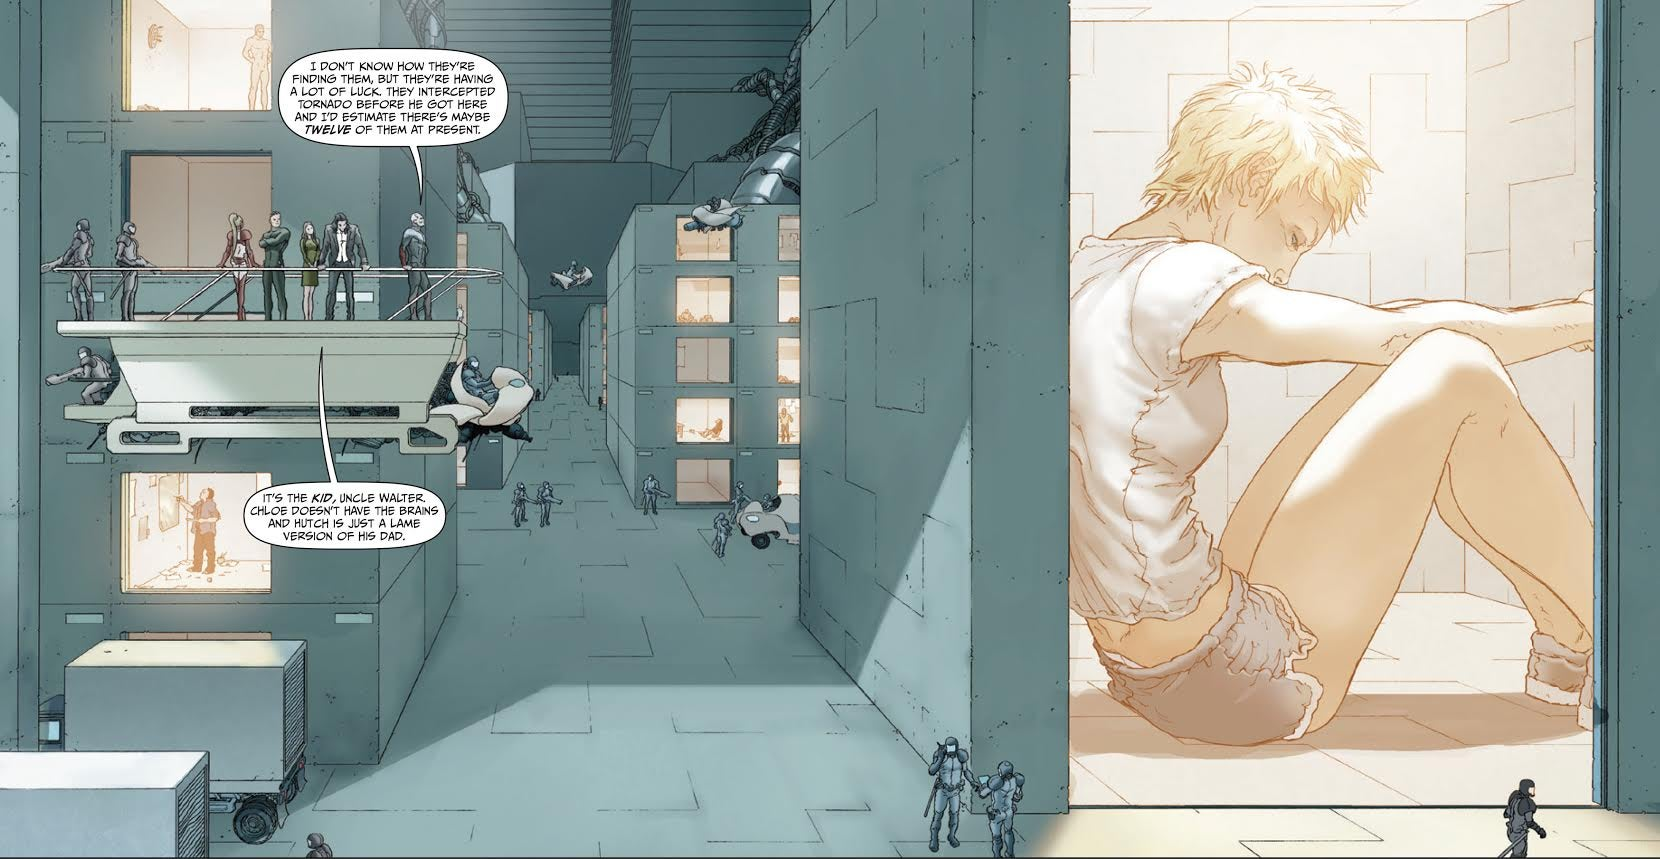 Jupiters Legacy 1 - Prison - Frank Quitely